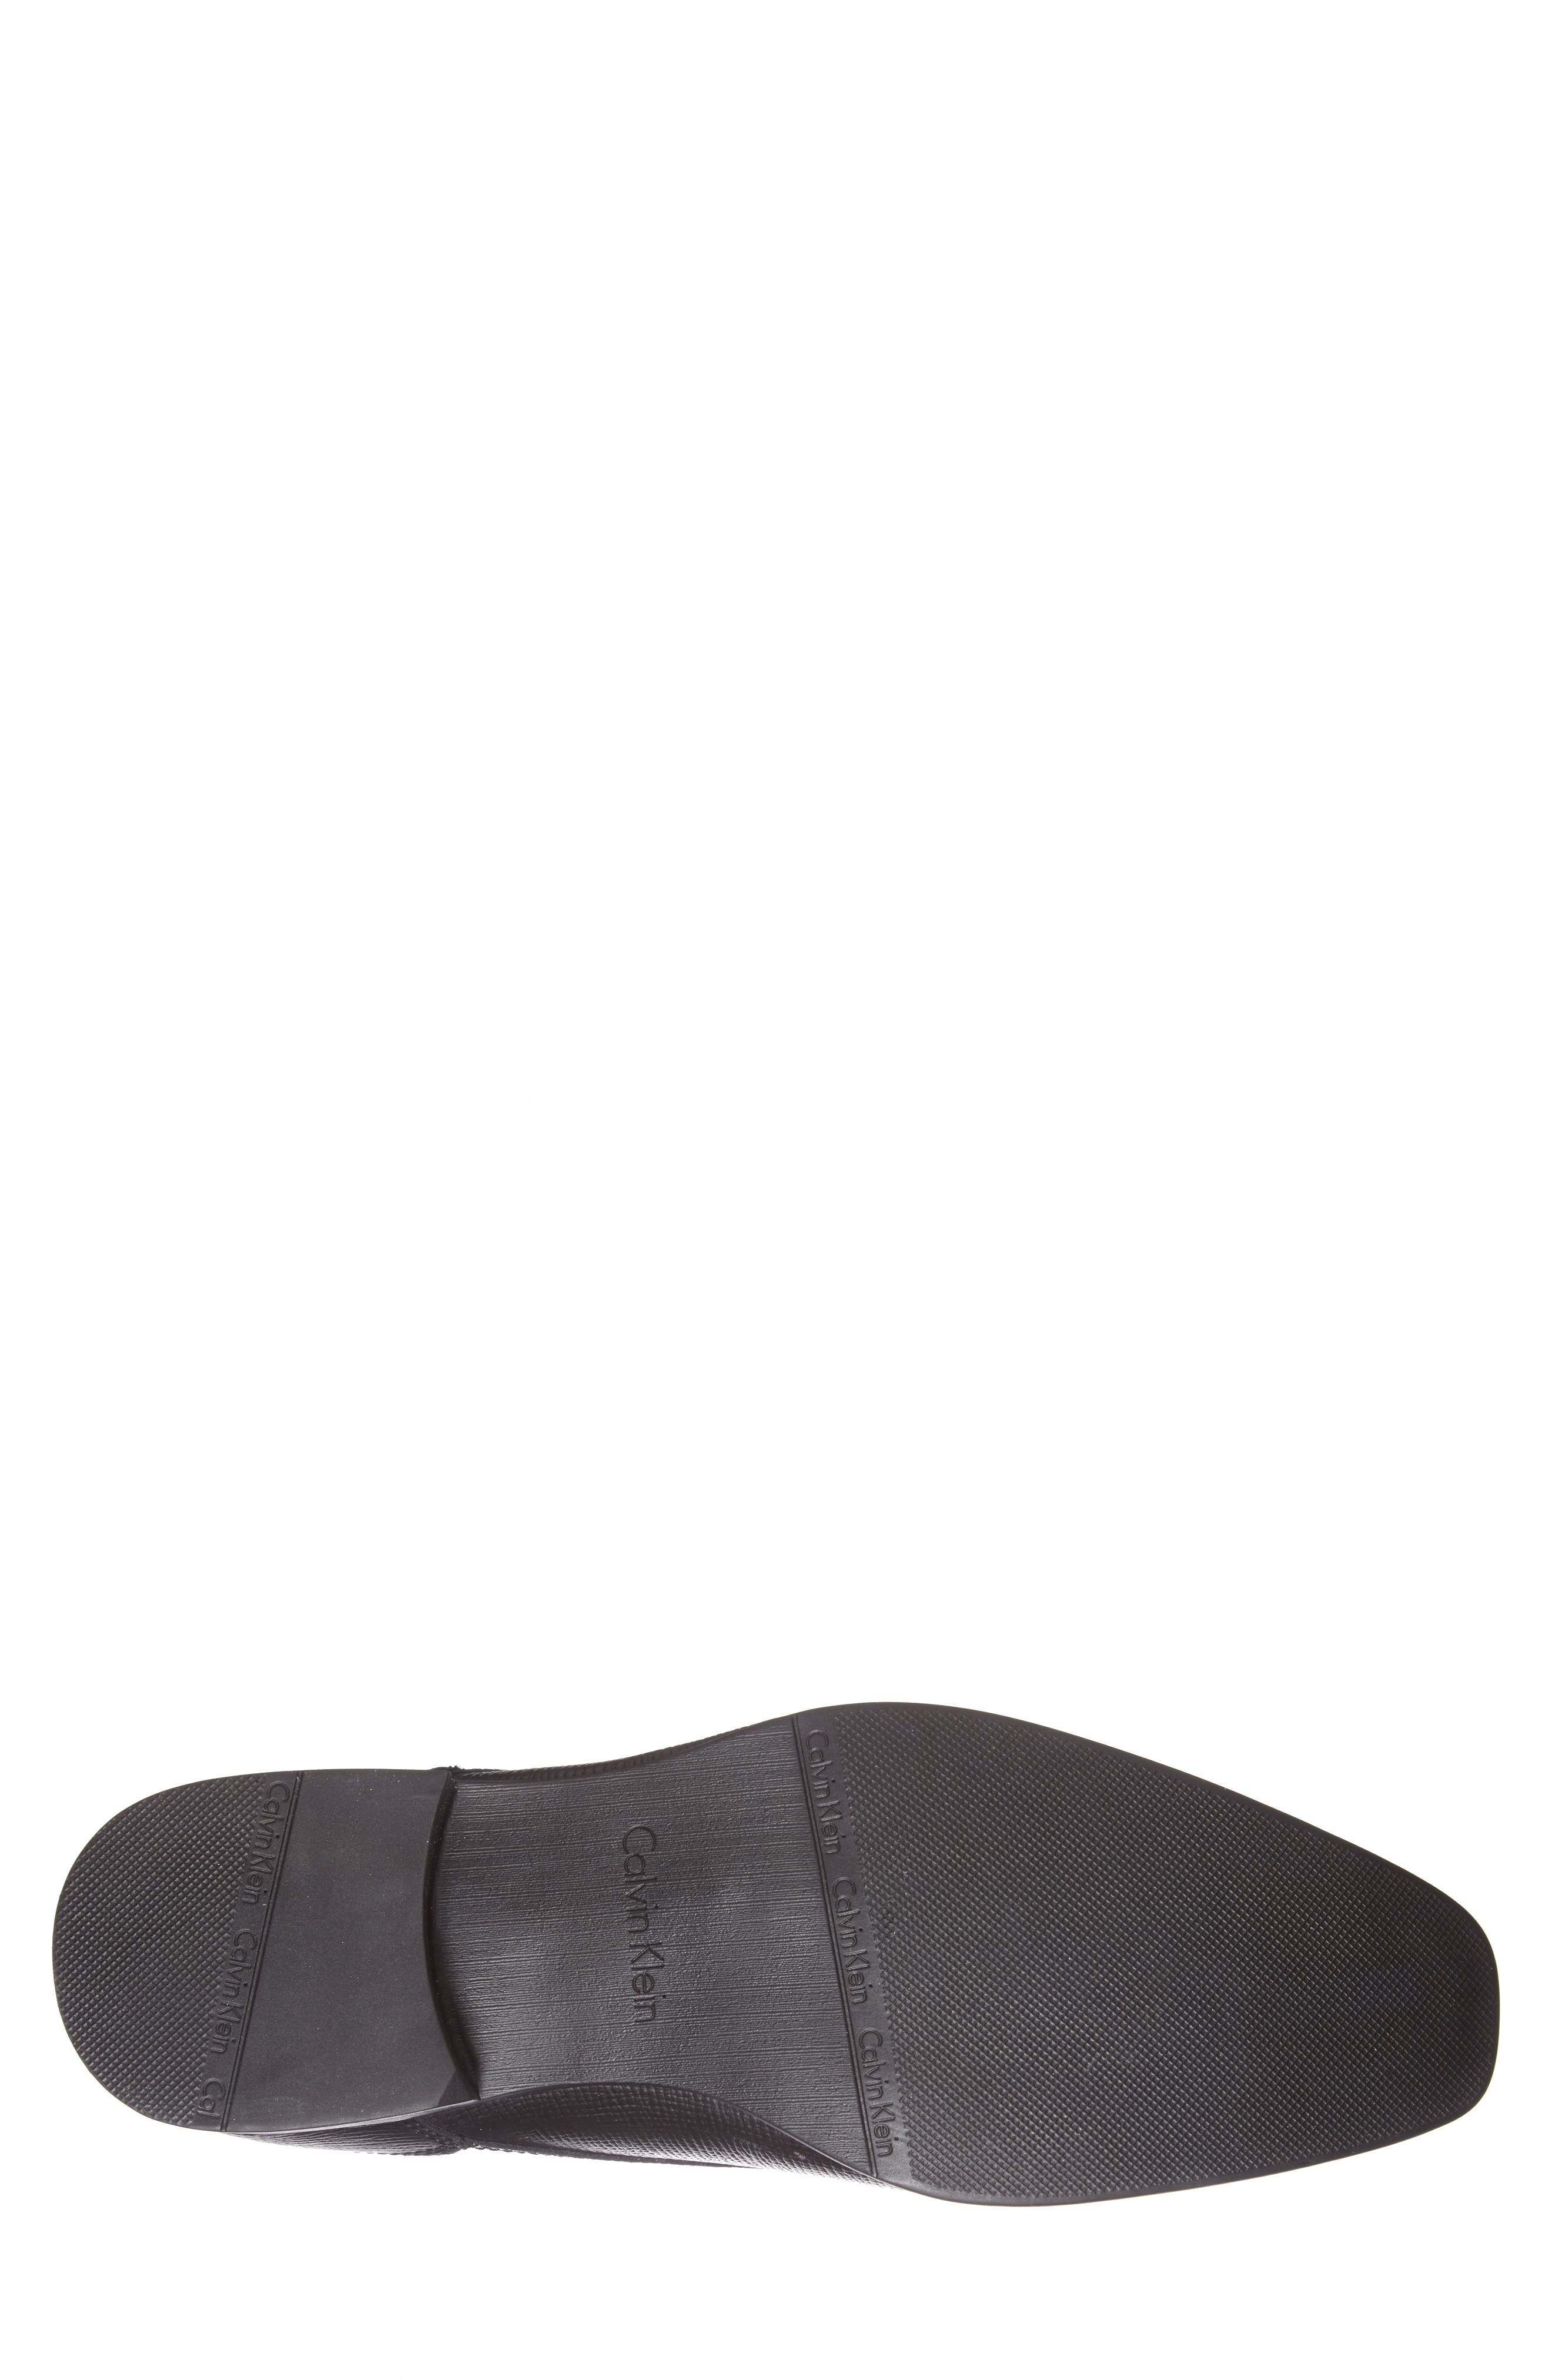 'Brodie' Plain Toe Derby,                             Alternate thumbnail 4, color,                             BLACK